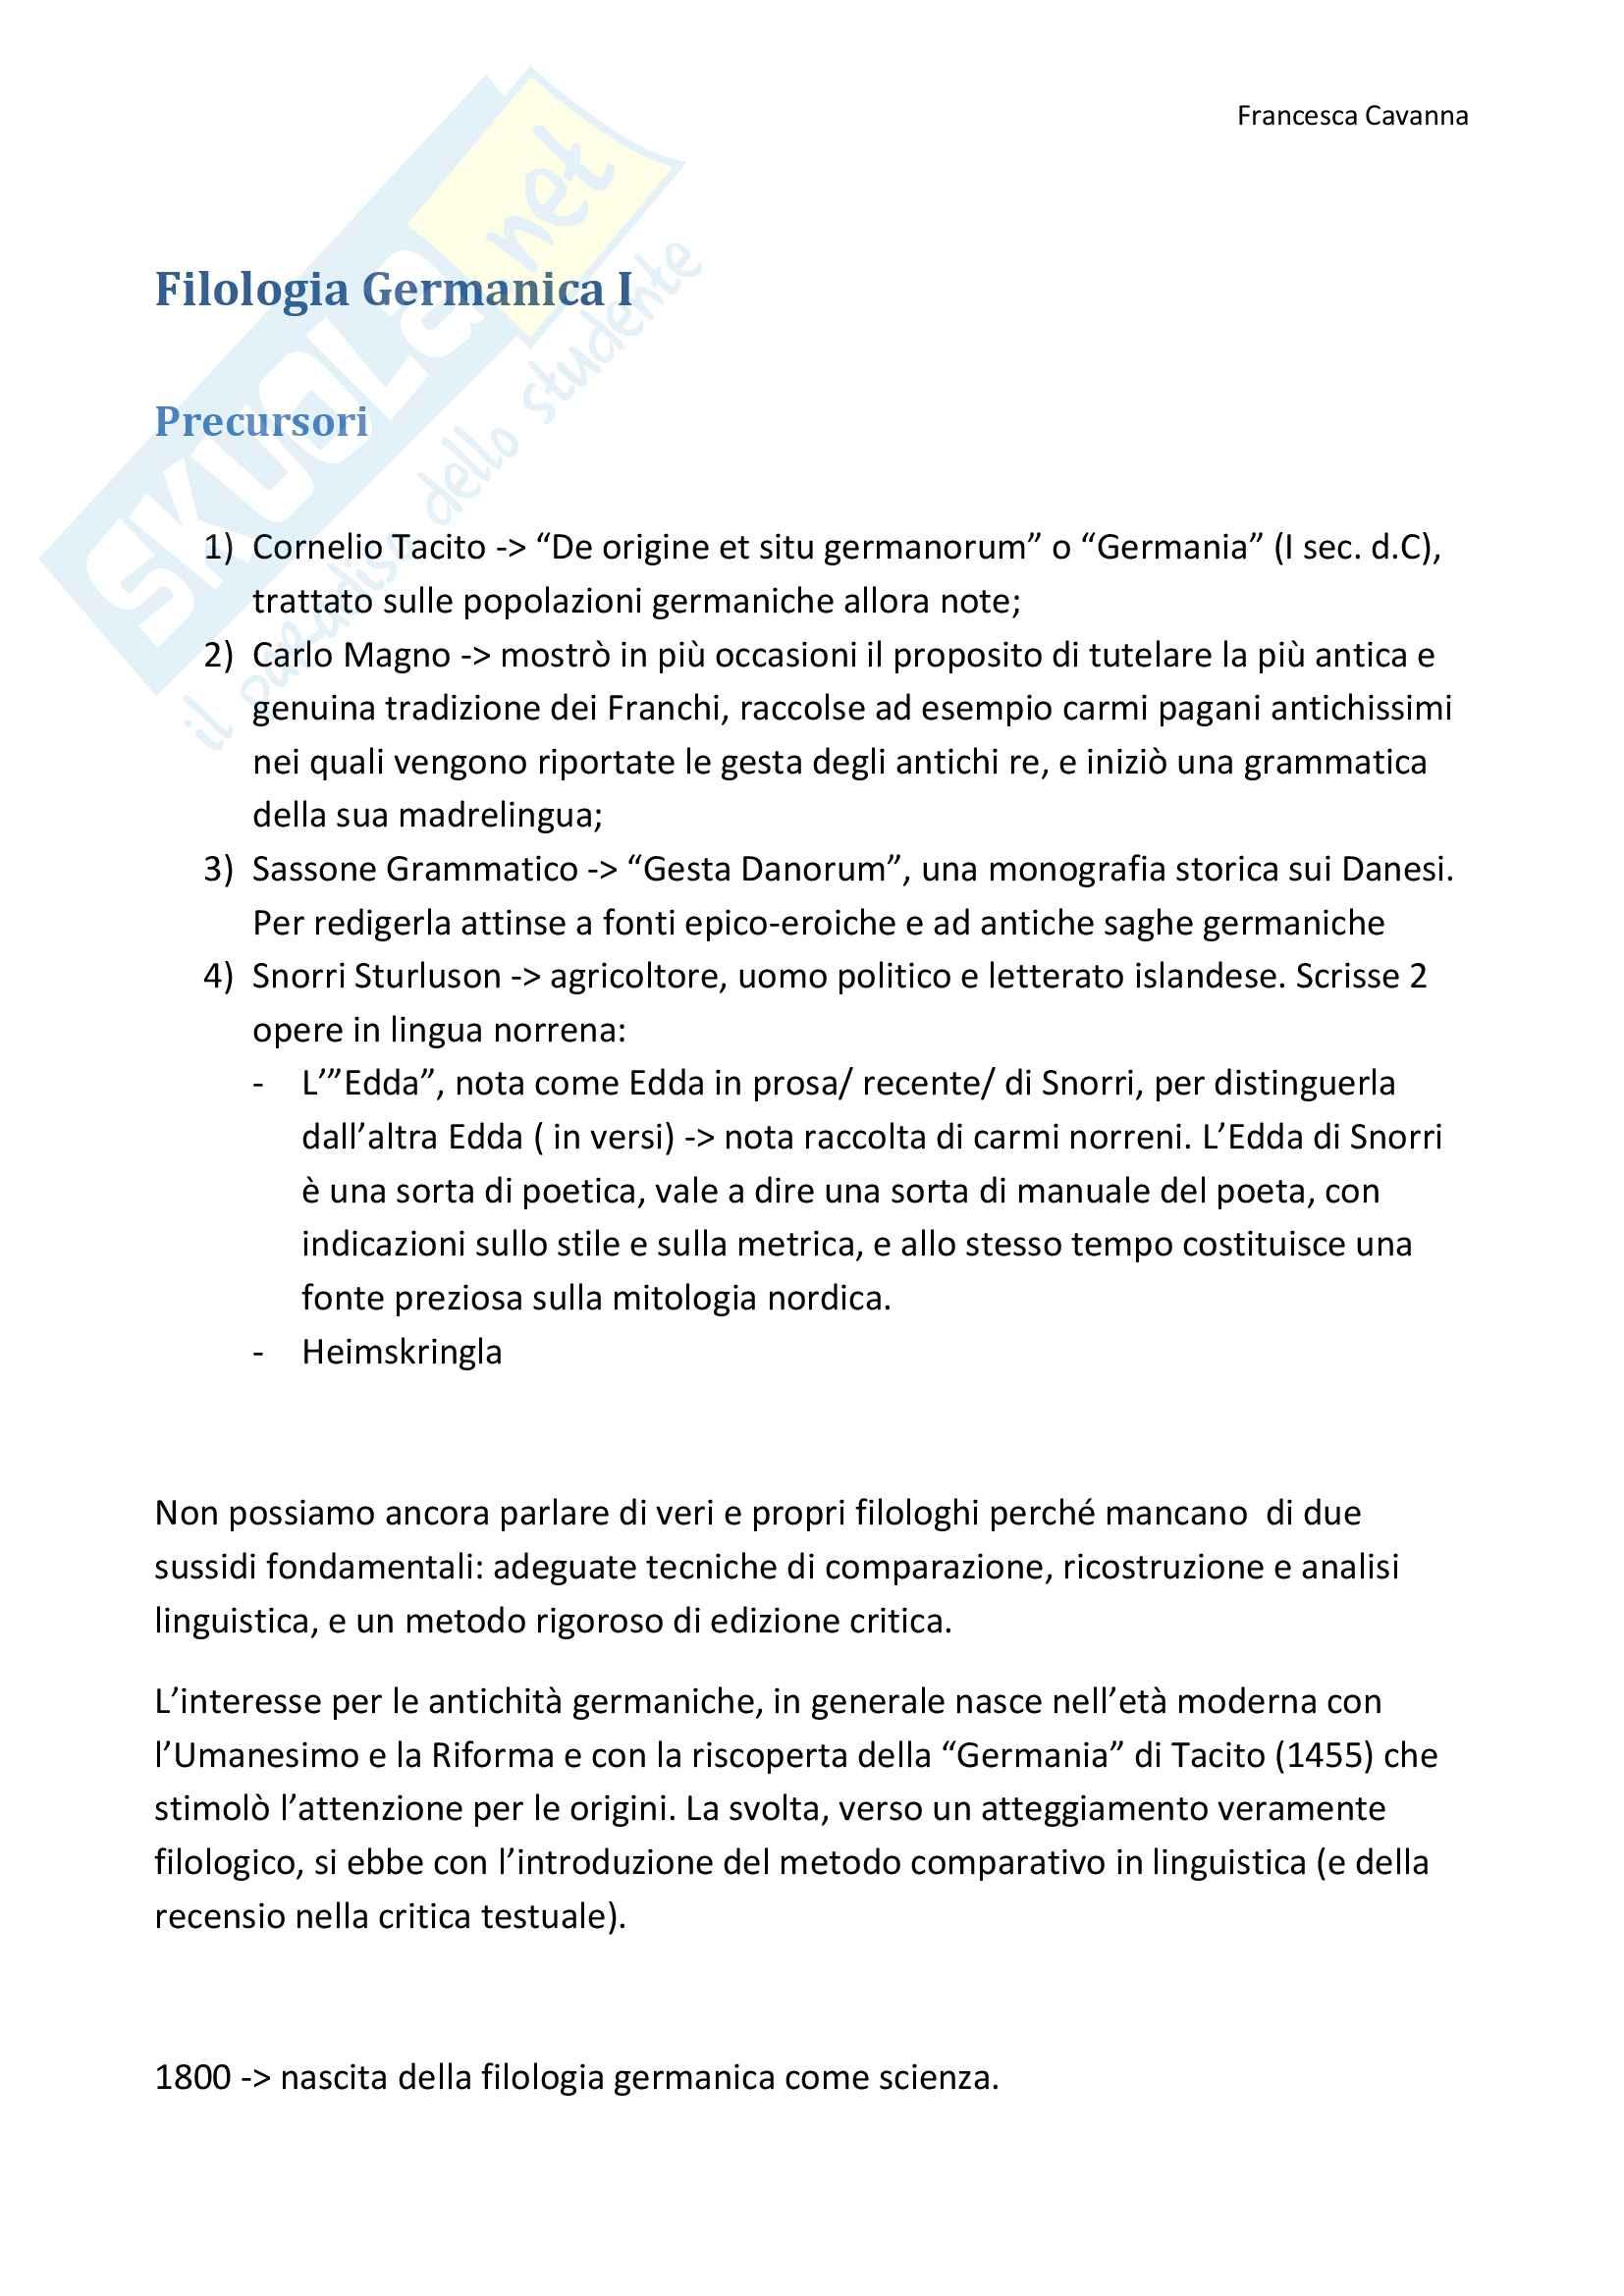 Filologia Germanica I